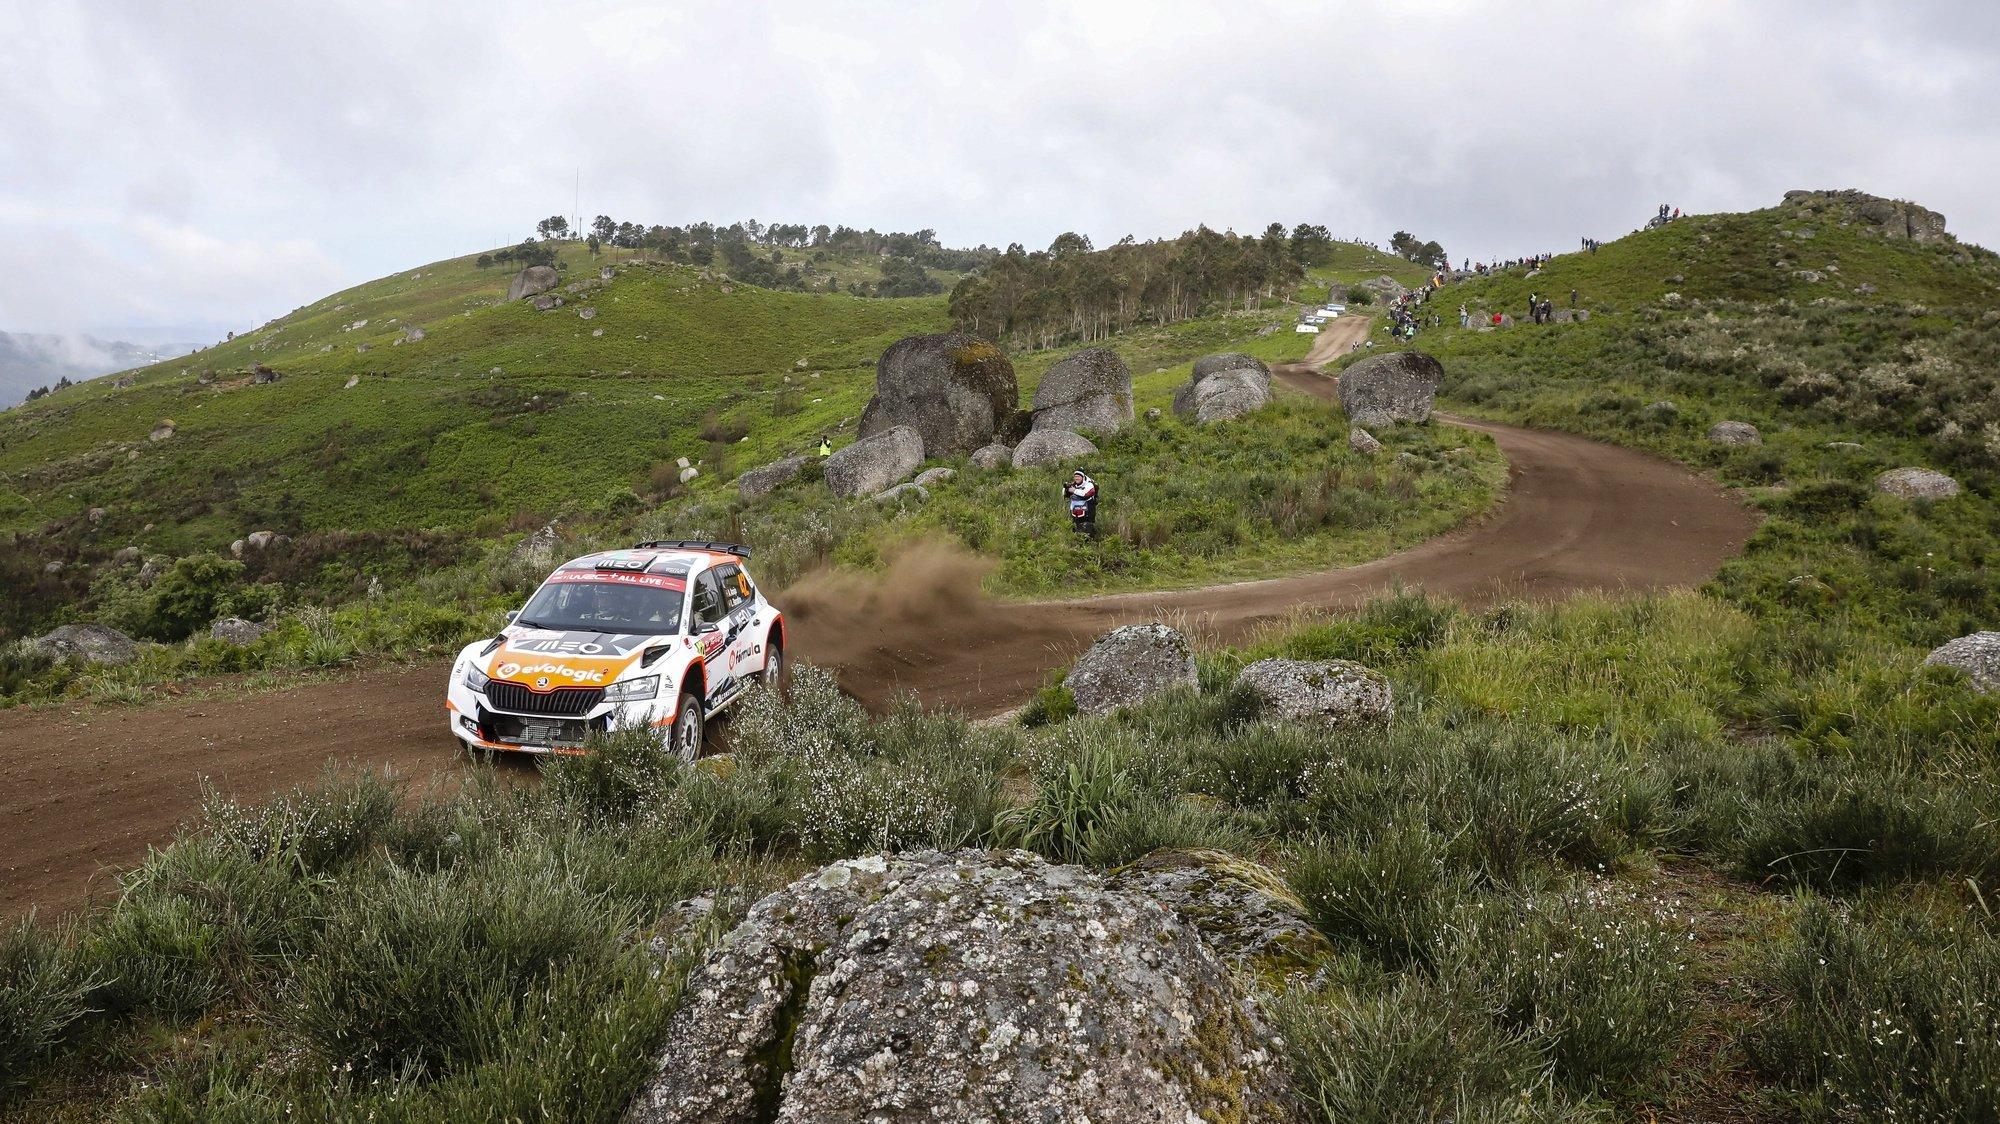 epa09219371 Armindo Araujo of Portugal drives his Skoda Fabia Evo WRC3 during Day 2 of the Rally Portugal 2021 as part of the FIA World Rally Championship (WRC) near Vieira do Minho, Portugal, 22 May 2021.  EPA/JOSE COELHO